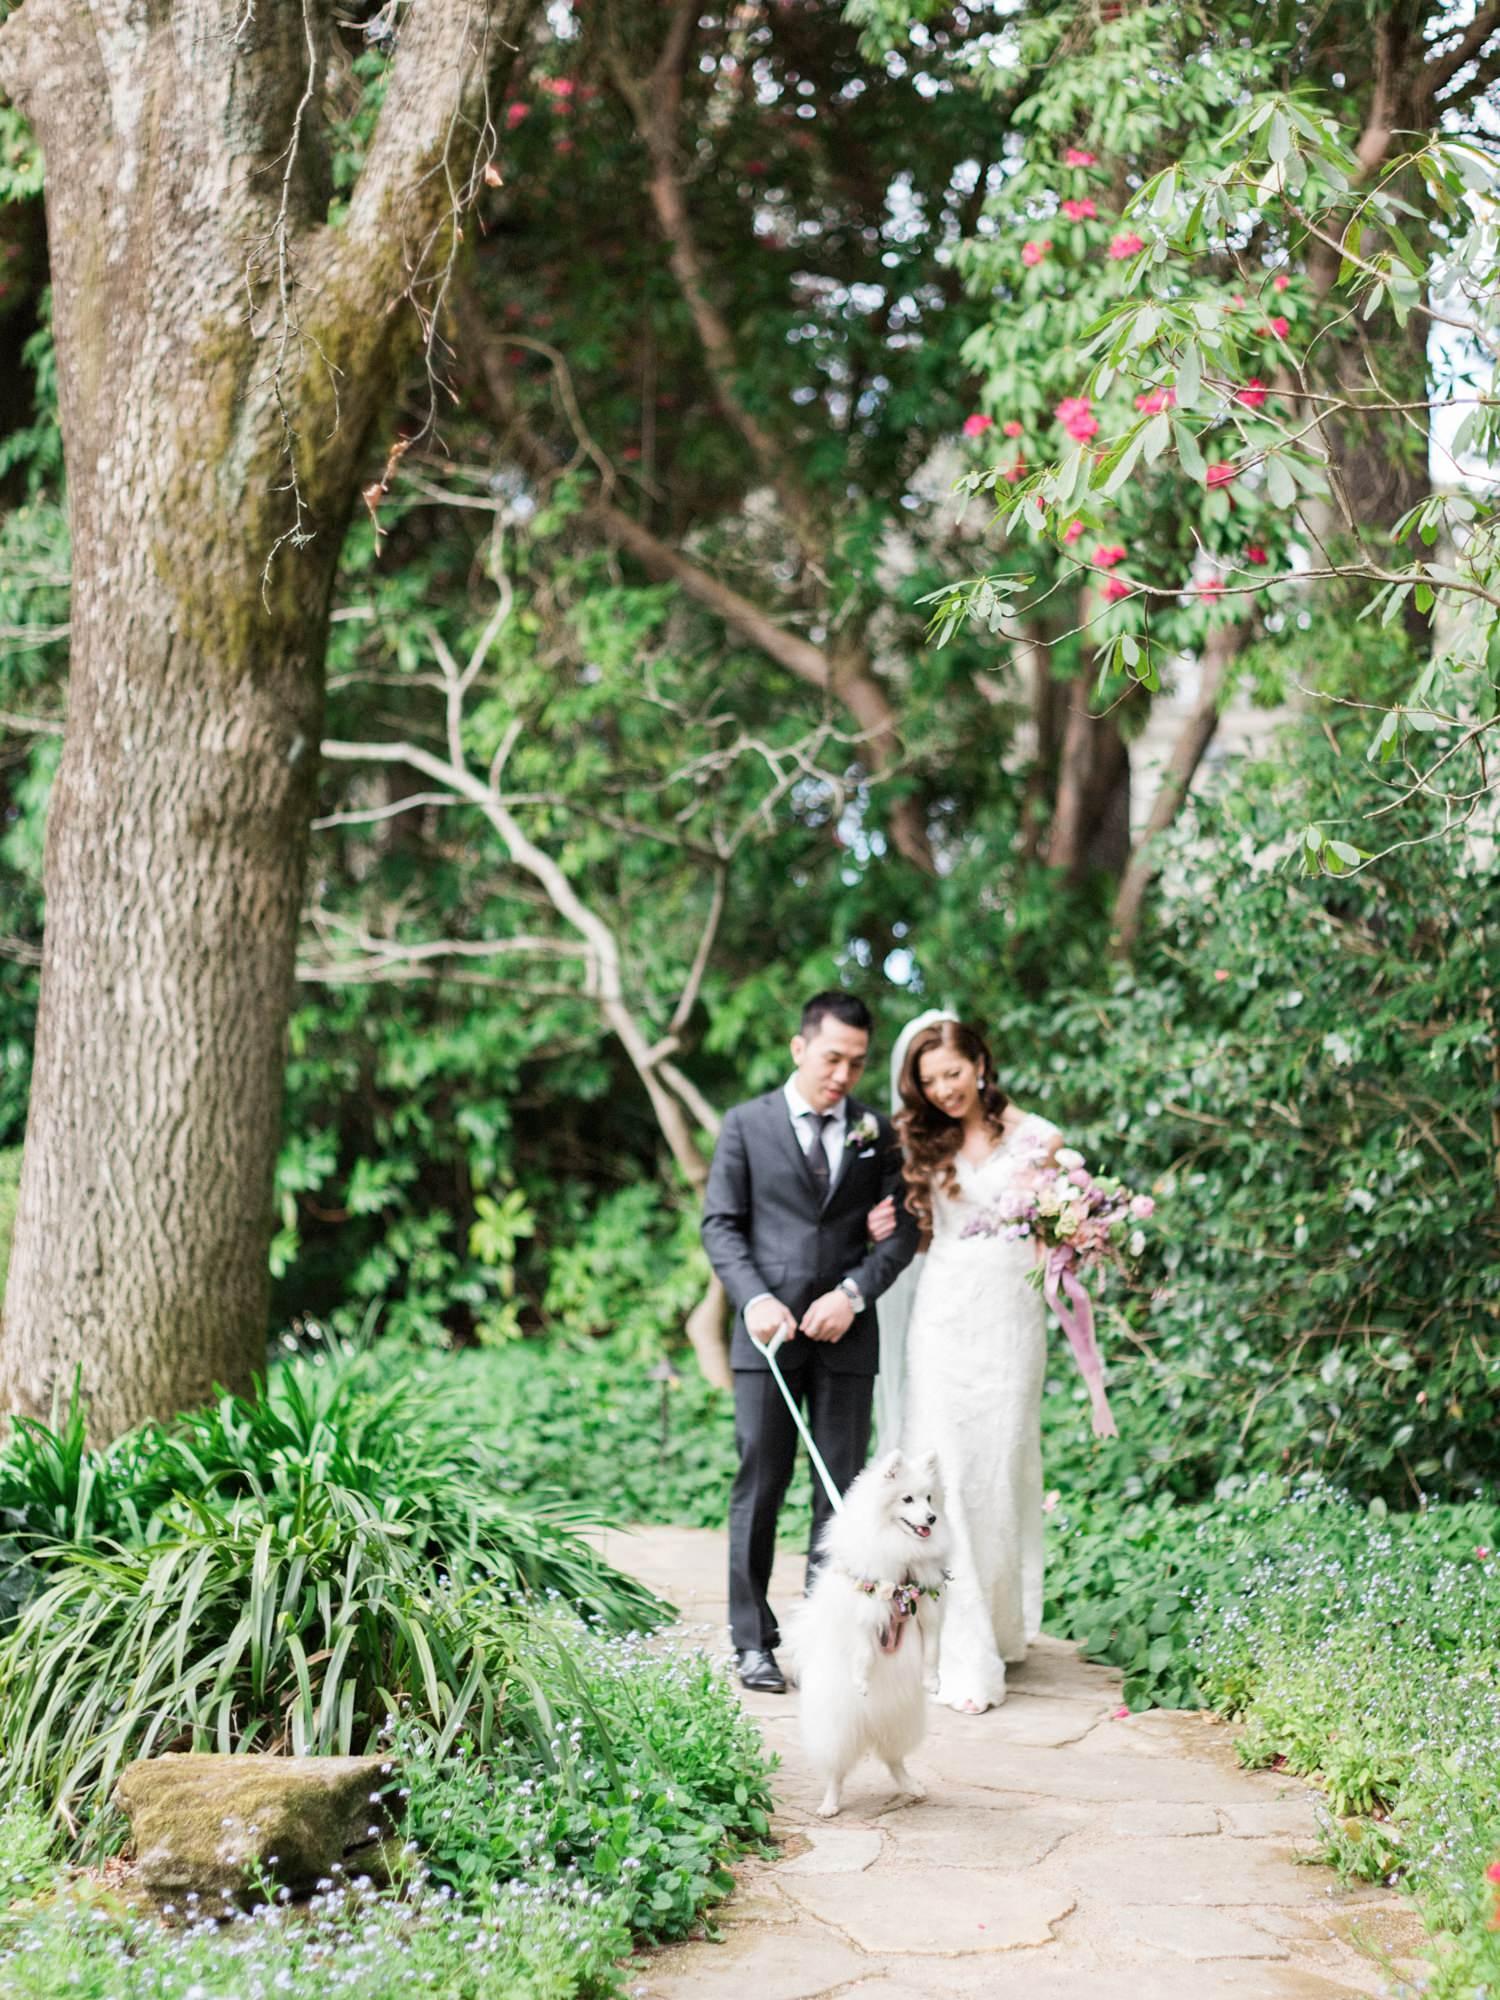 Somphors&dong-wedding-0281.jpg